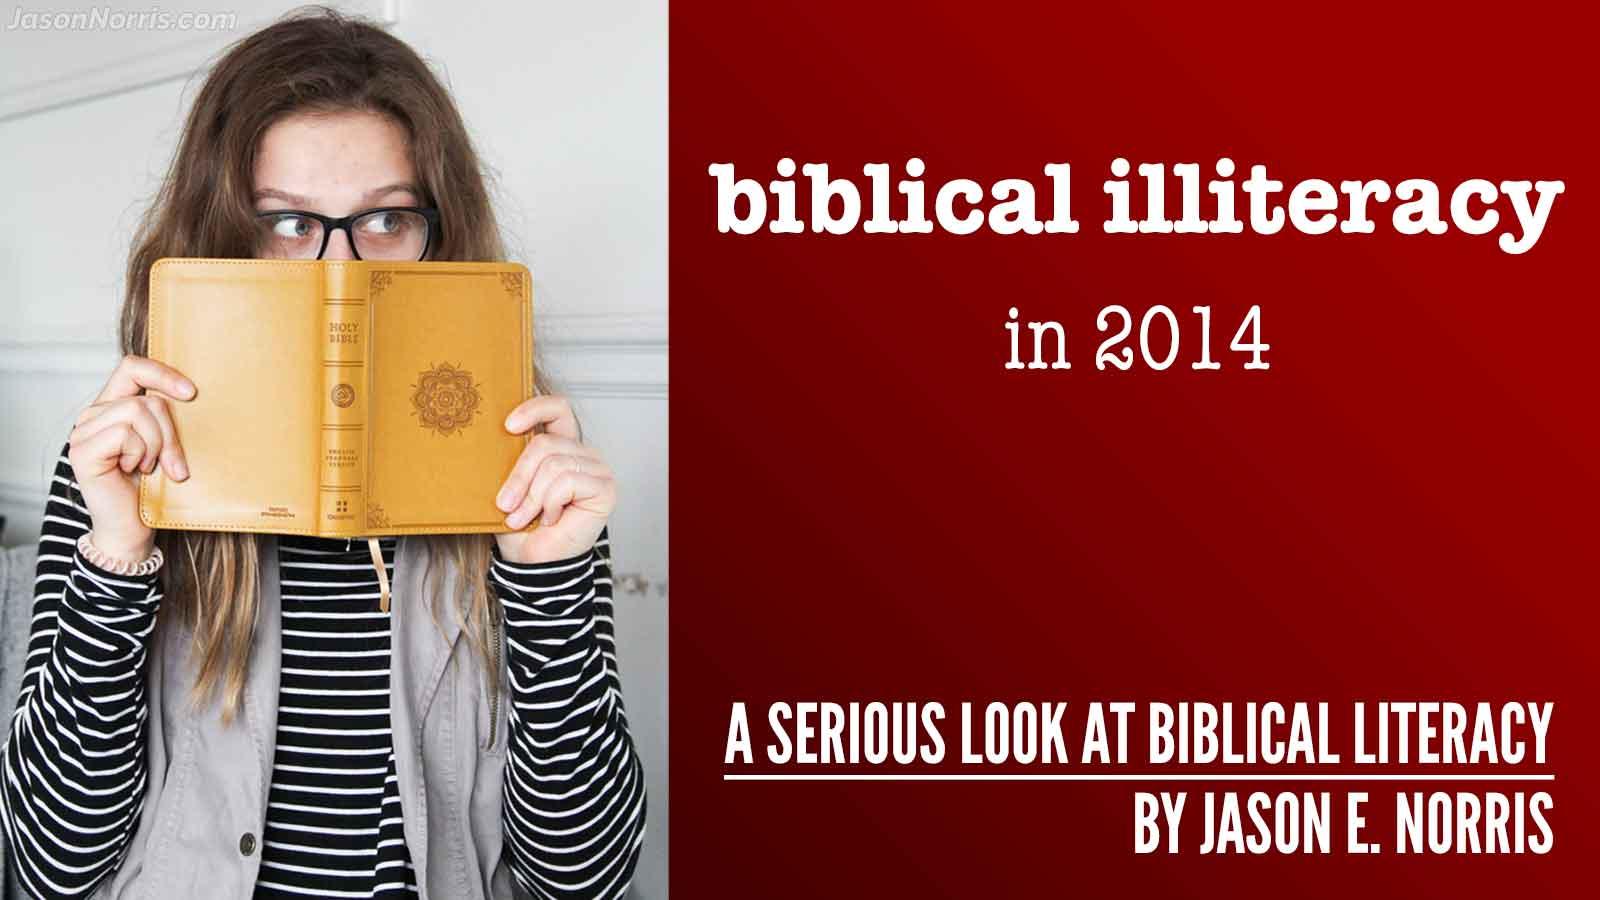 Biblical illiteracy in 2014 by Jason E. Norris